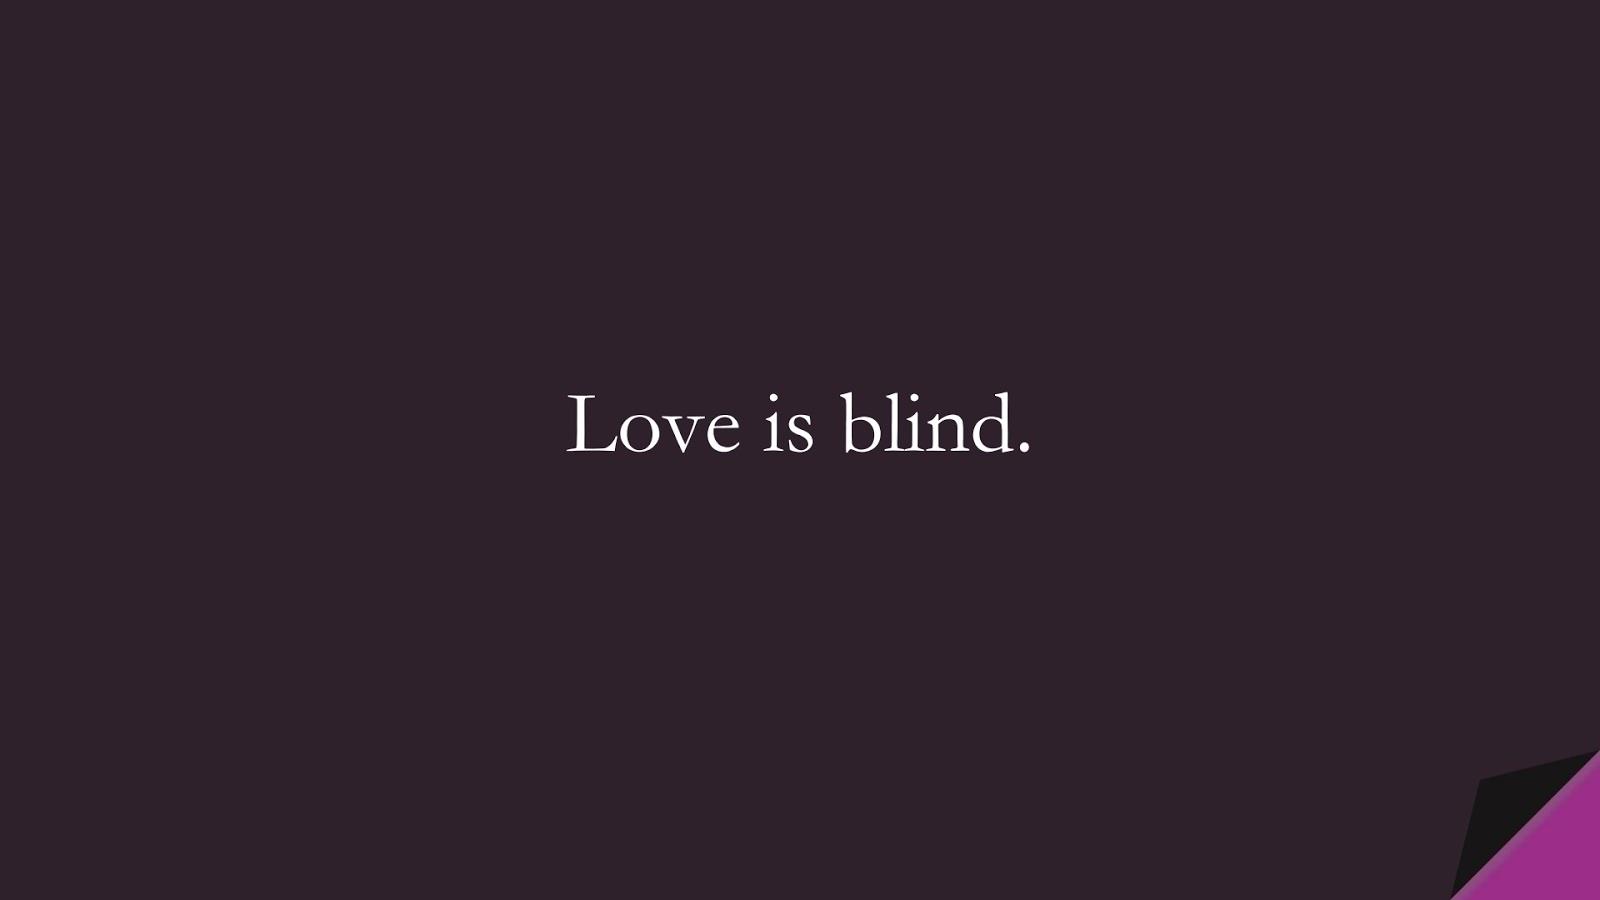 Love is blind.FALSE